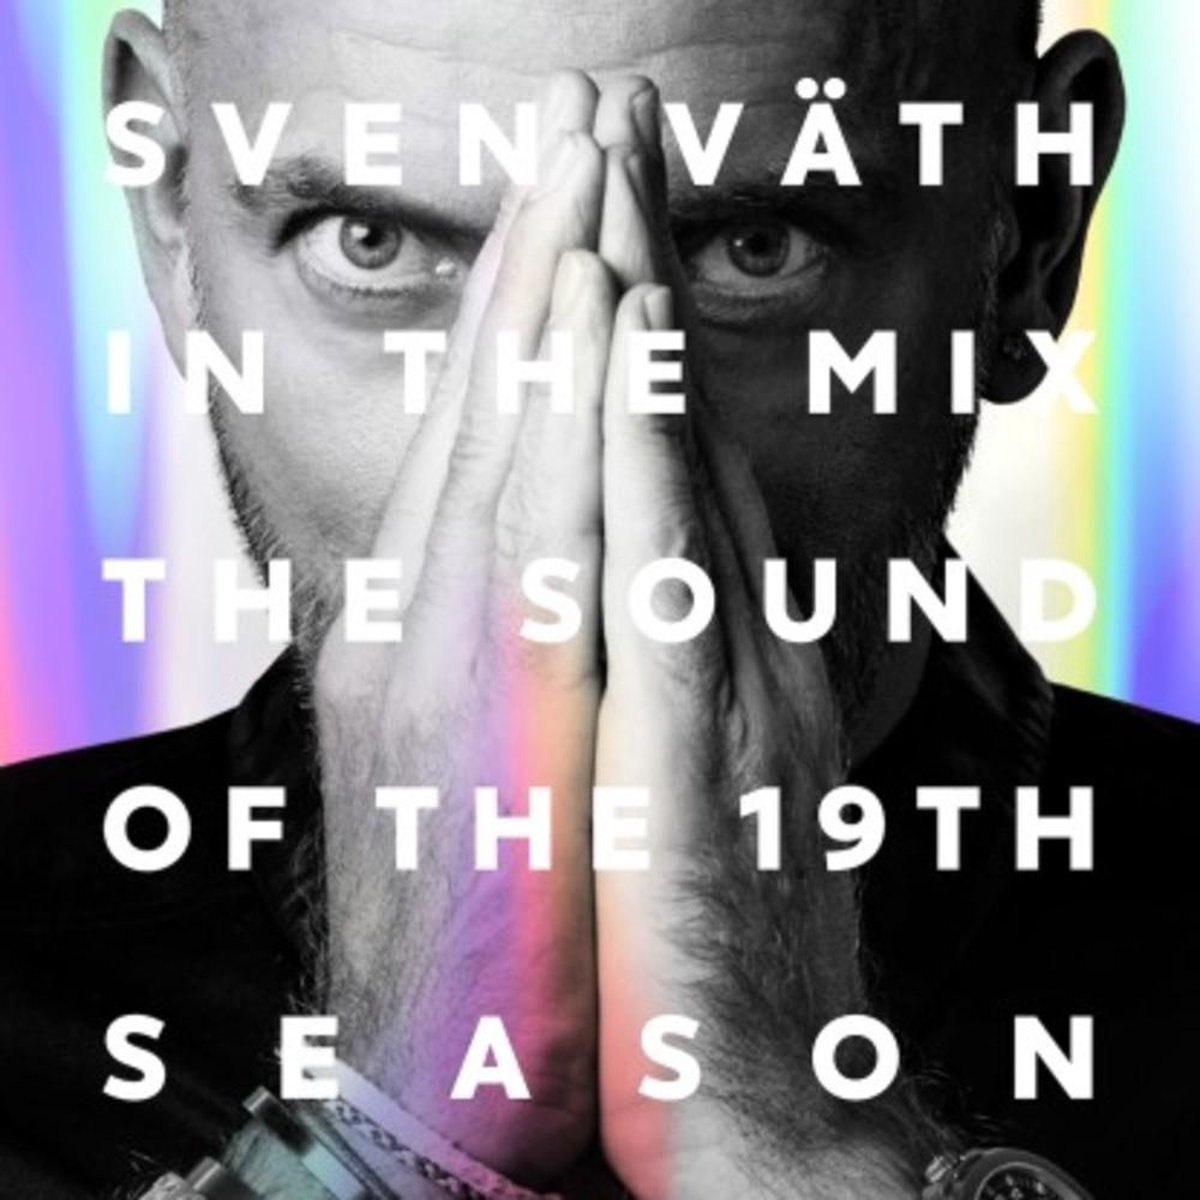 The Sound Of The 19Th Season - Sven Vath